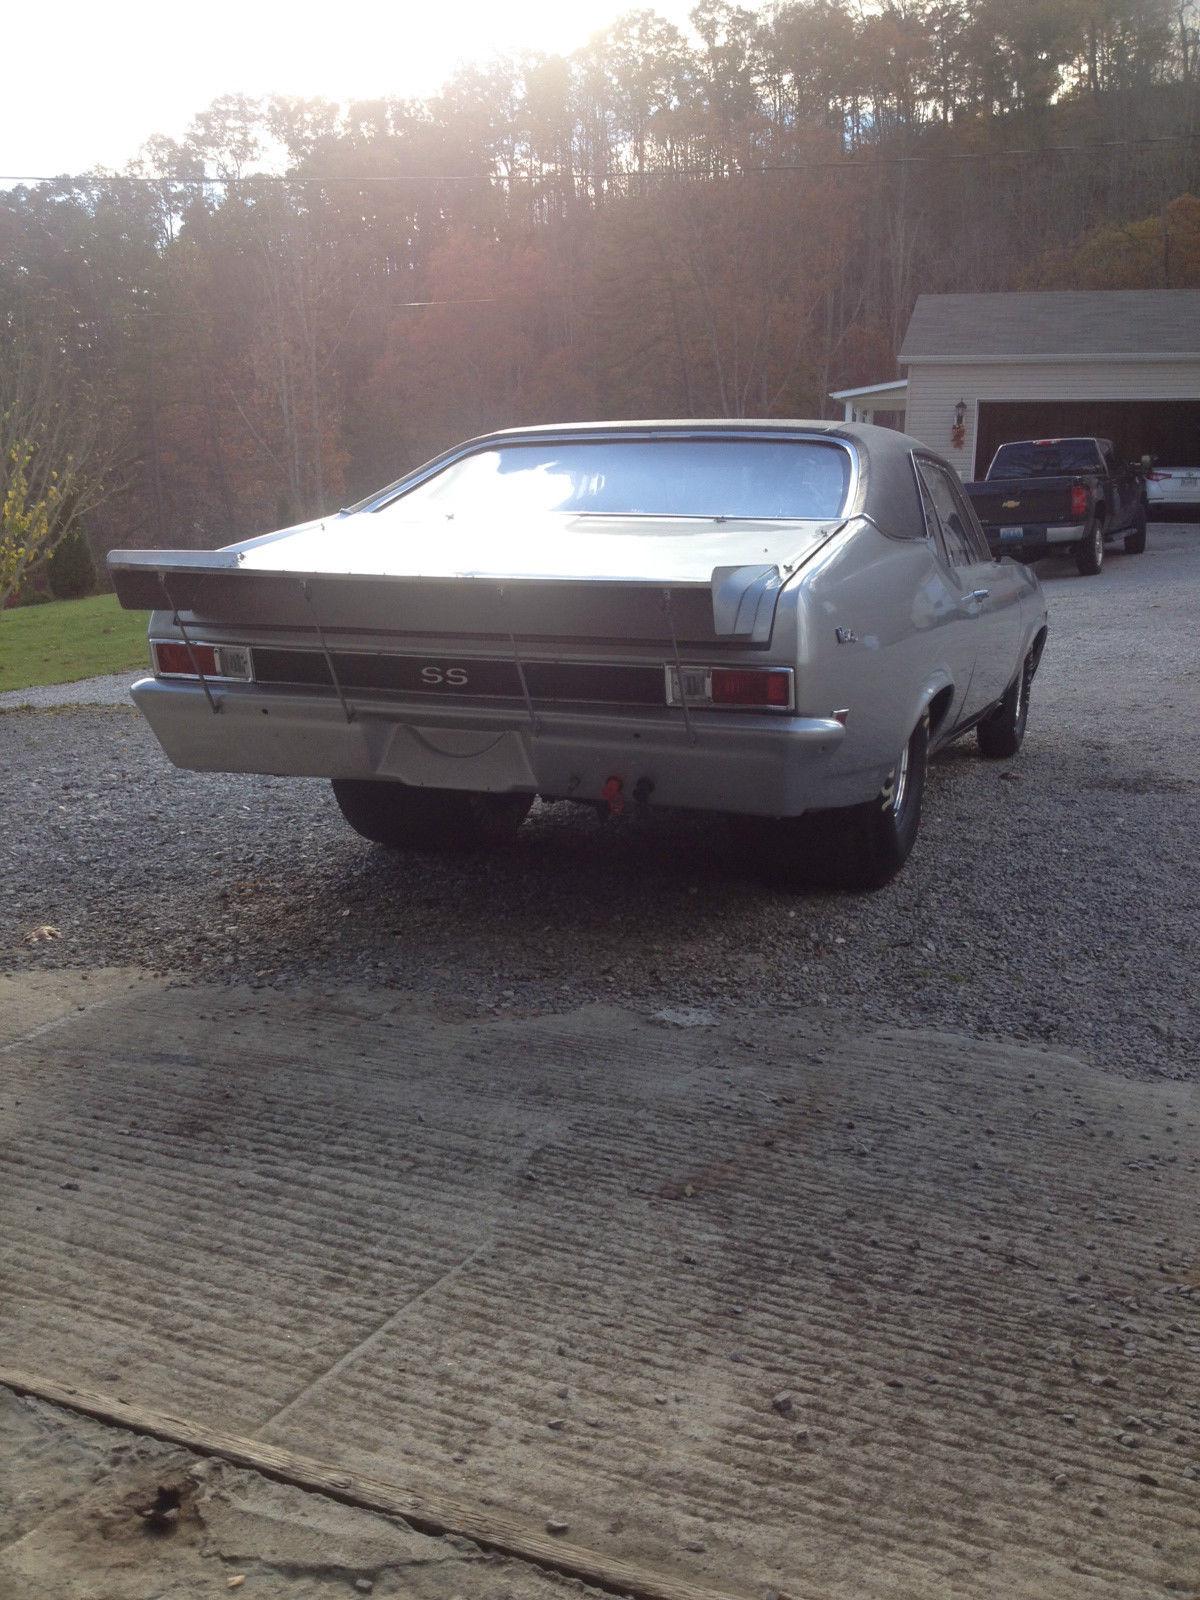 1968 Chevrolet Nova Drag Car 434 Sb New Paint Trim Tail